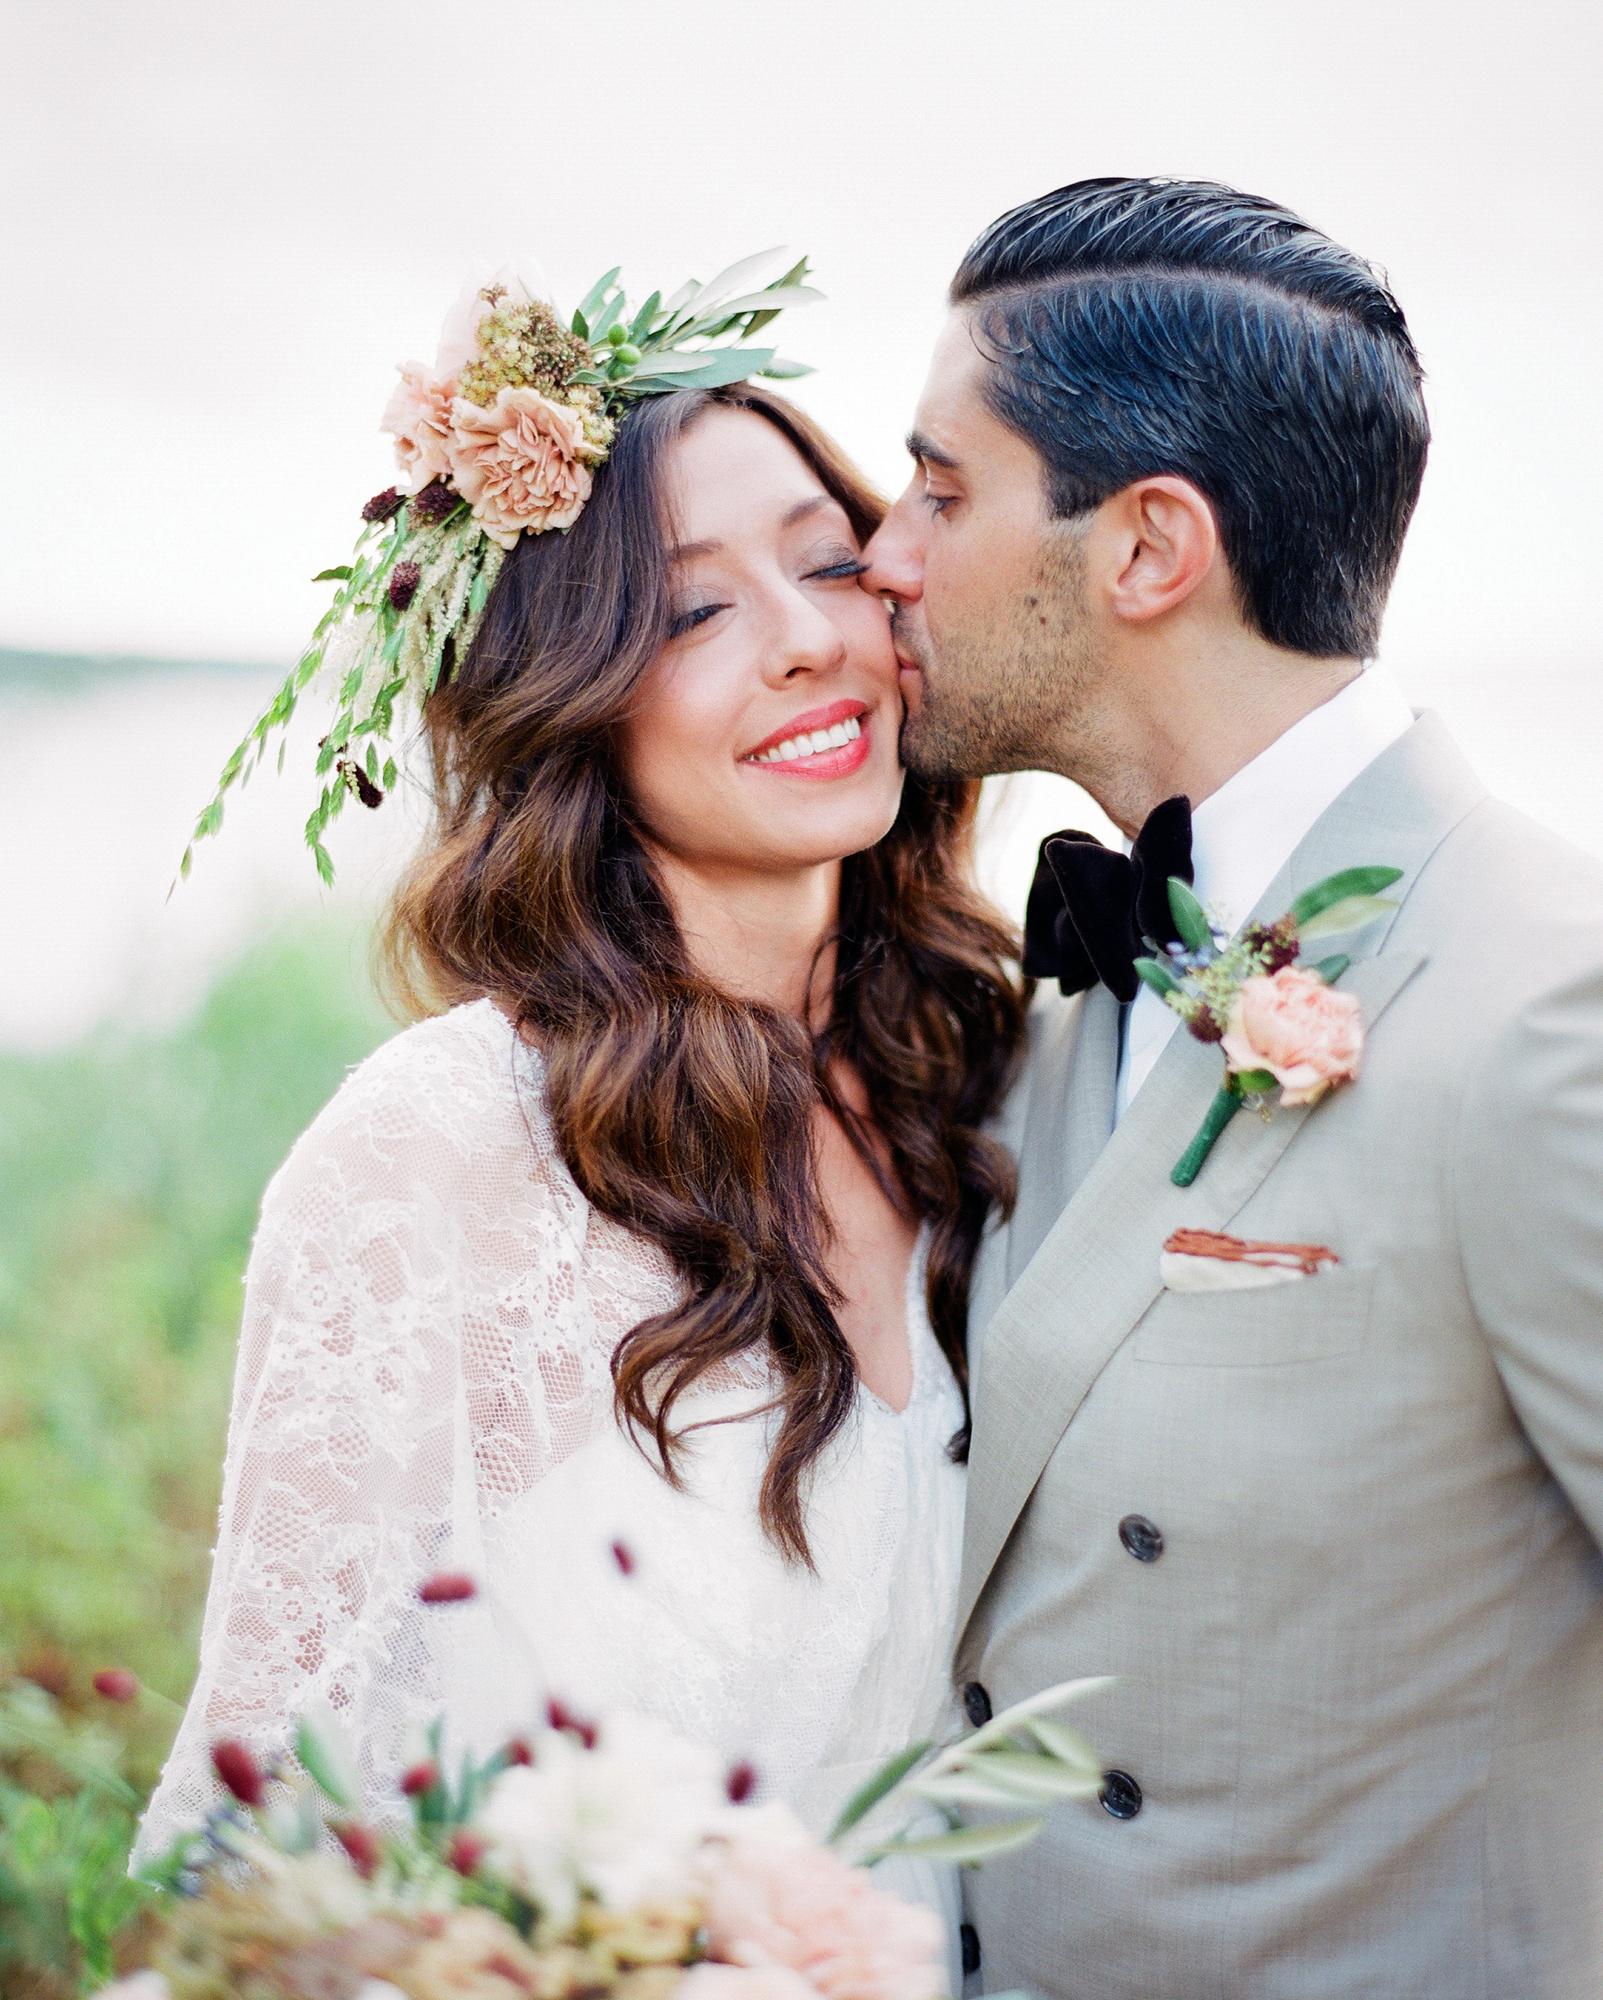 negin-chris-wedding-couple-0101-s112116-0815.jpg